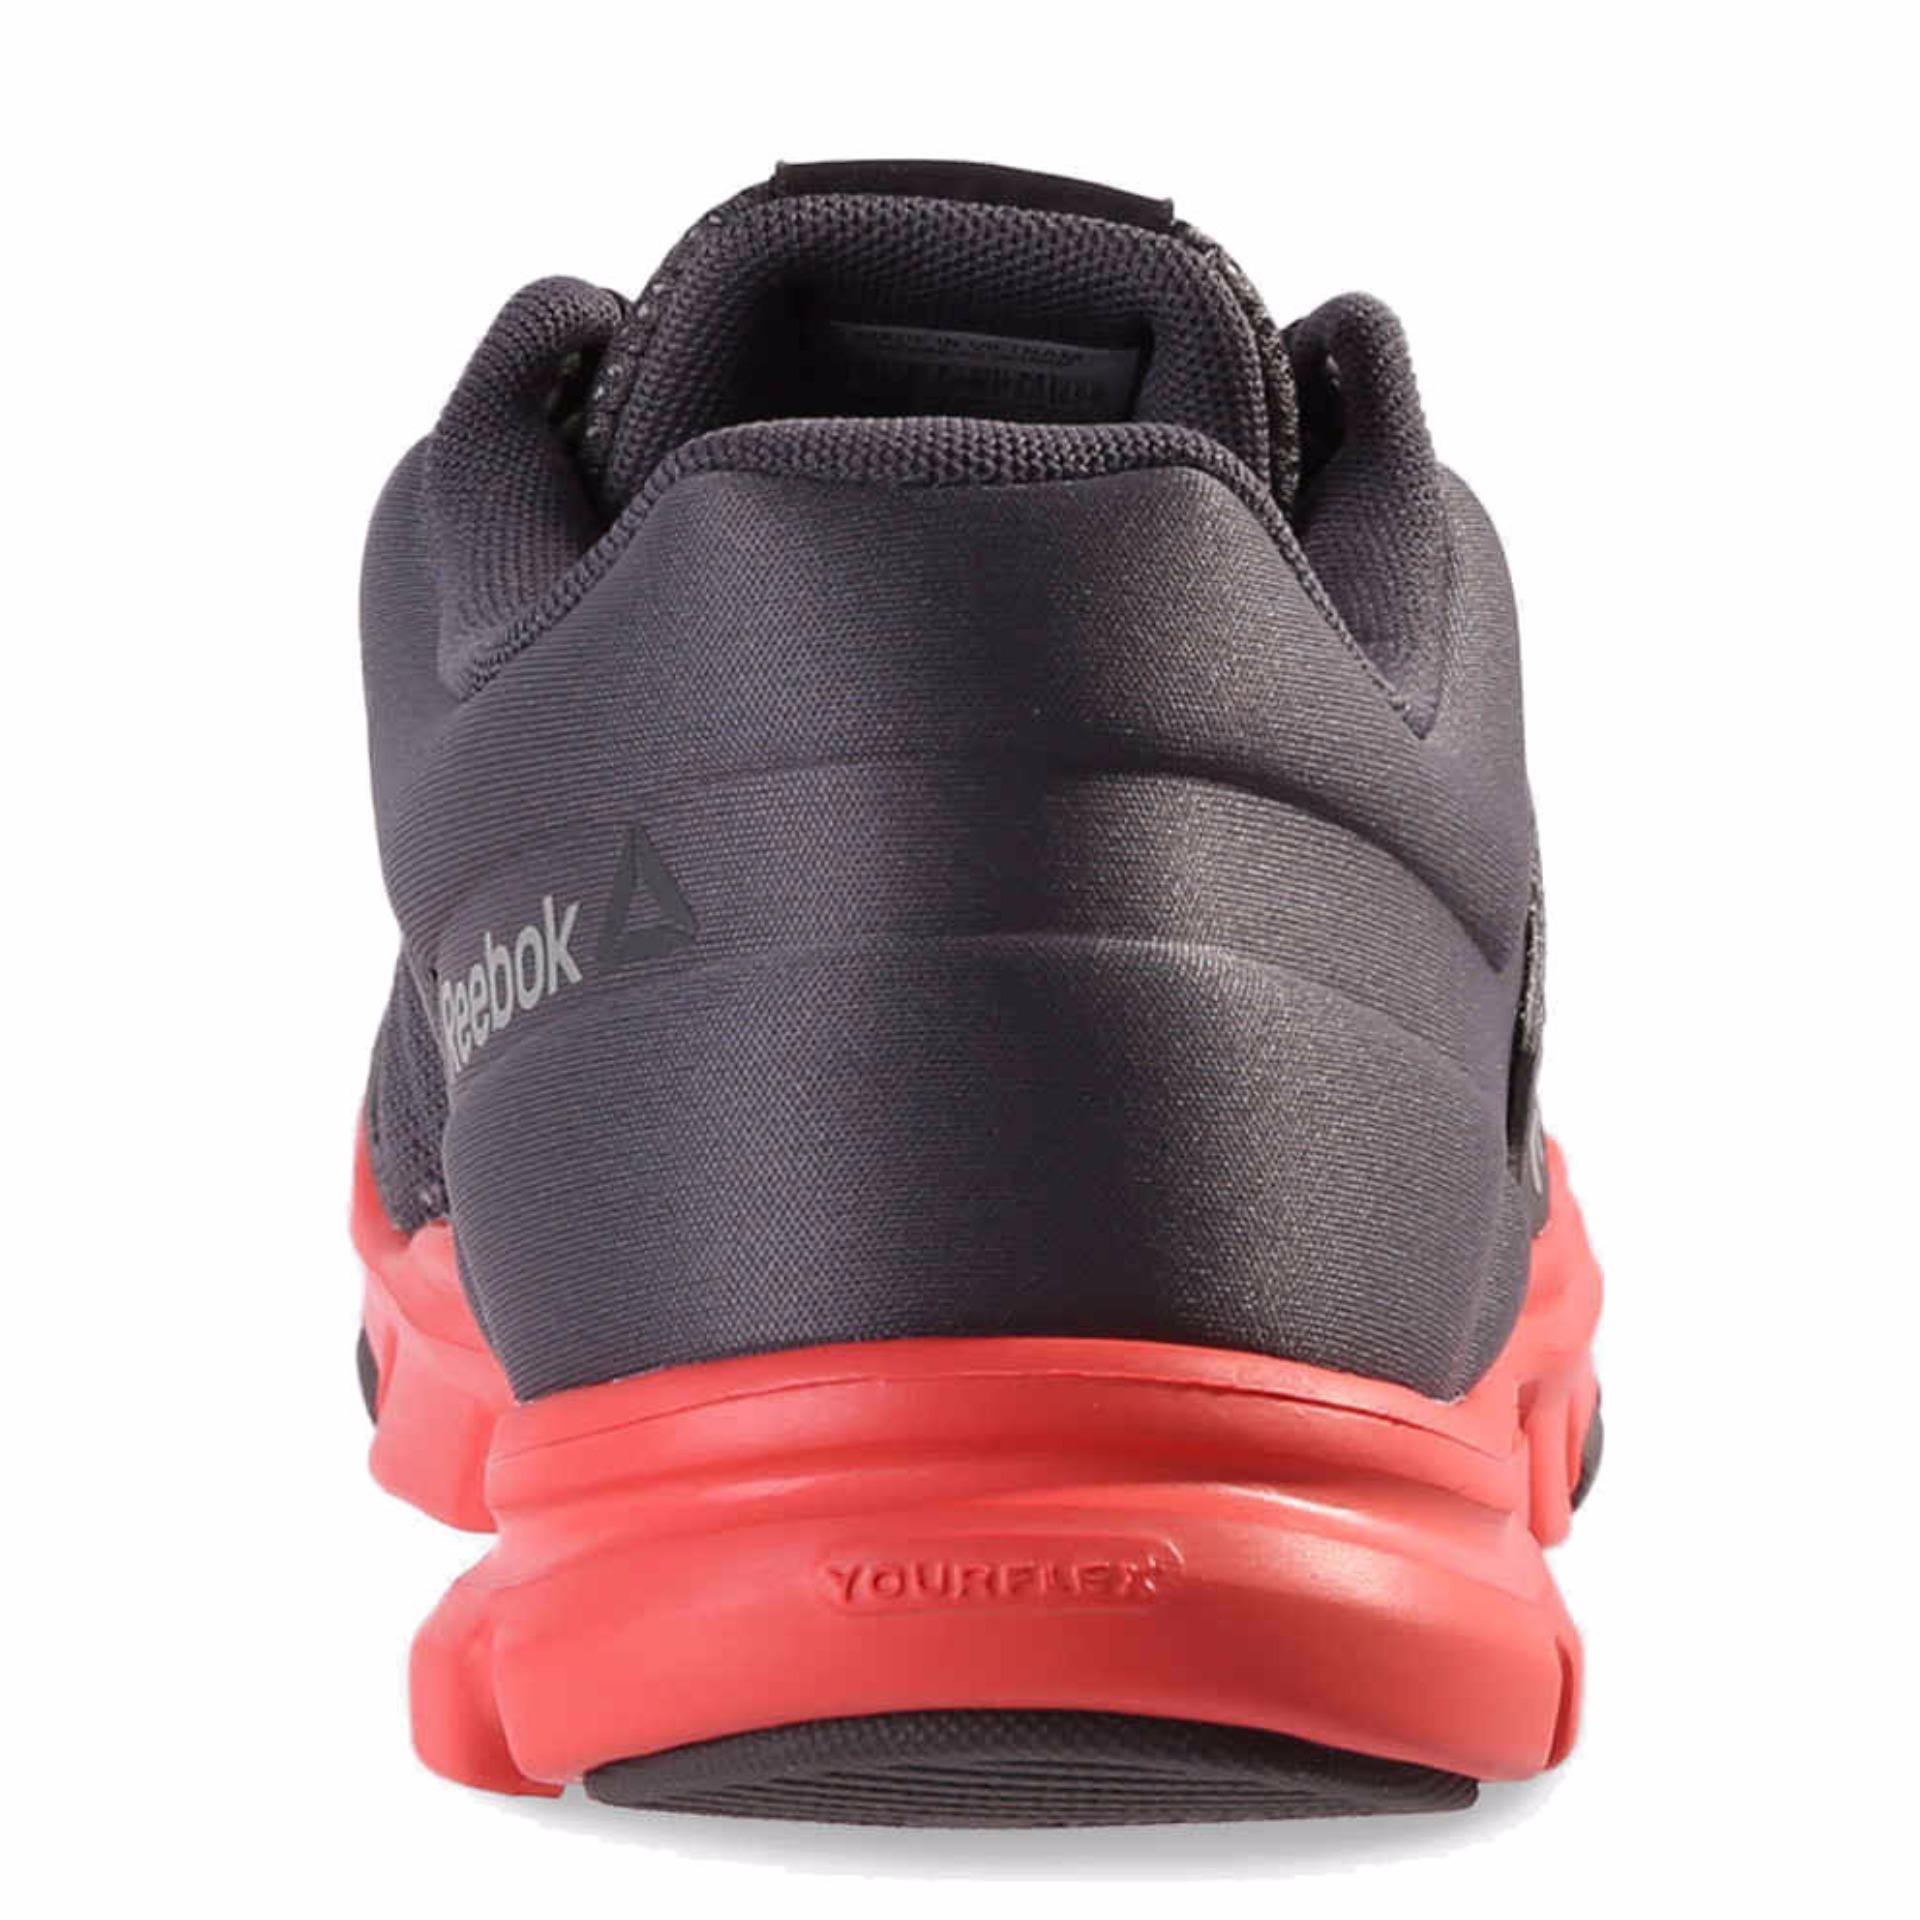 Reebok Yourflex Trainette 9 0 Mt Womens Training Shoes Abu Abu ... 2aa9b5a31f